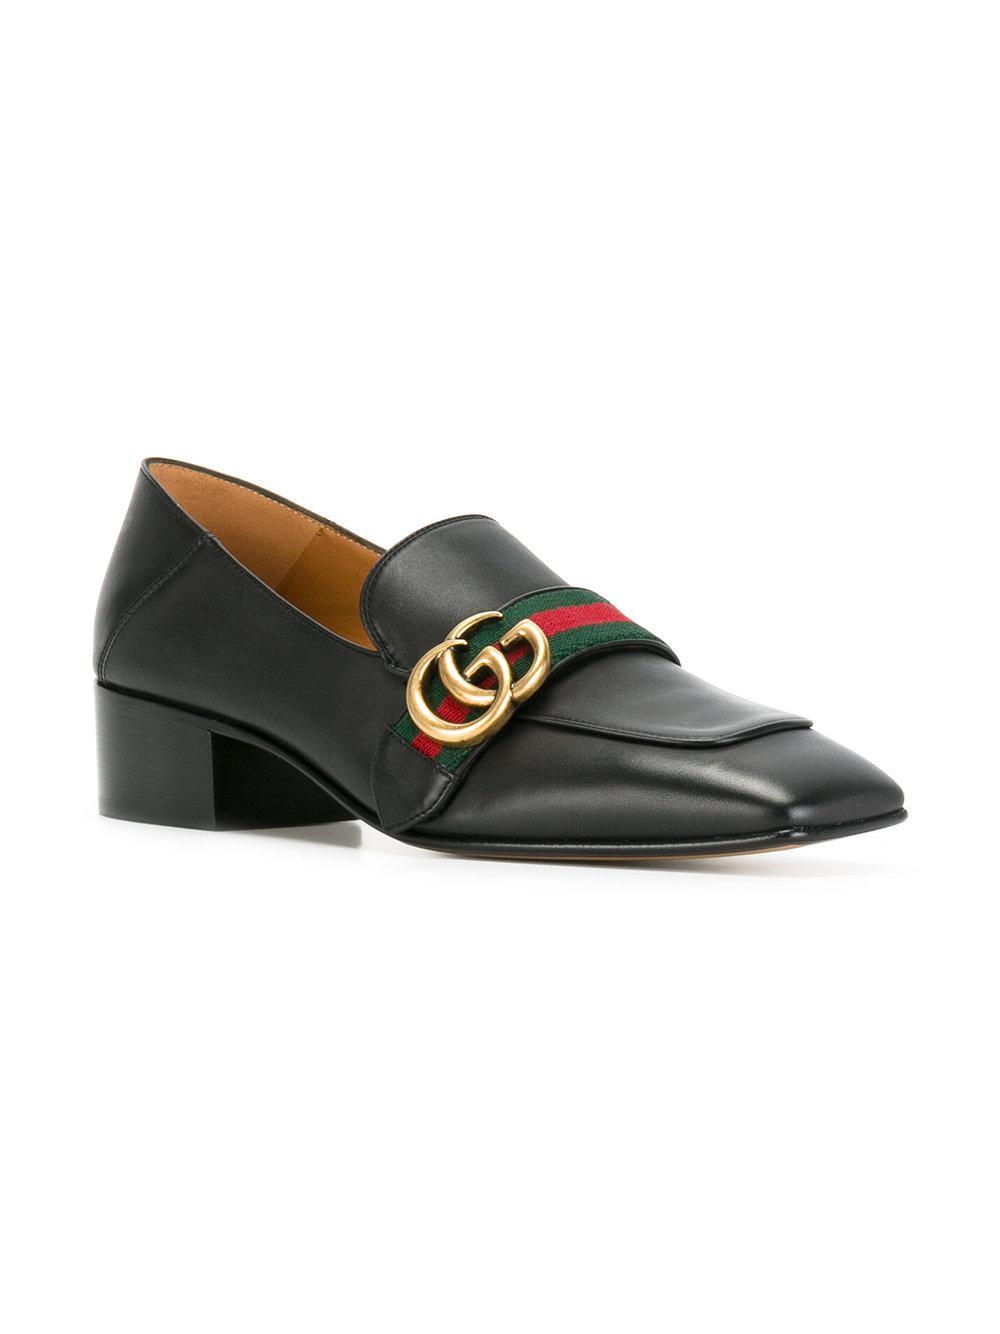 e912e804973 Lyst - Gucci Gg Web Low-heel Loafer Pumps in Black